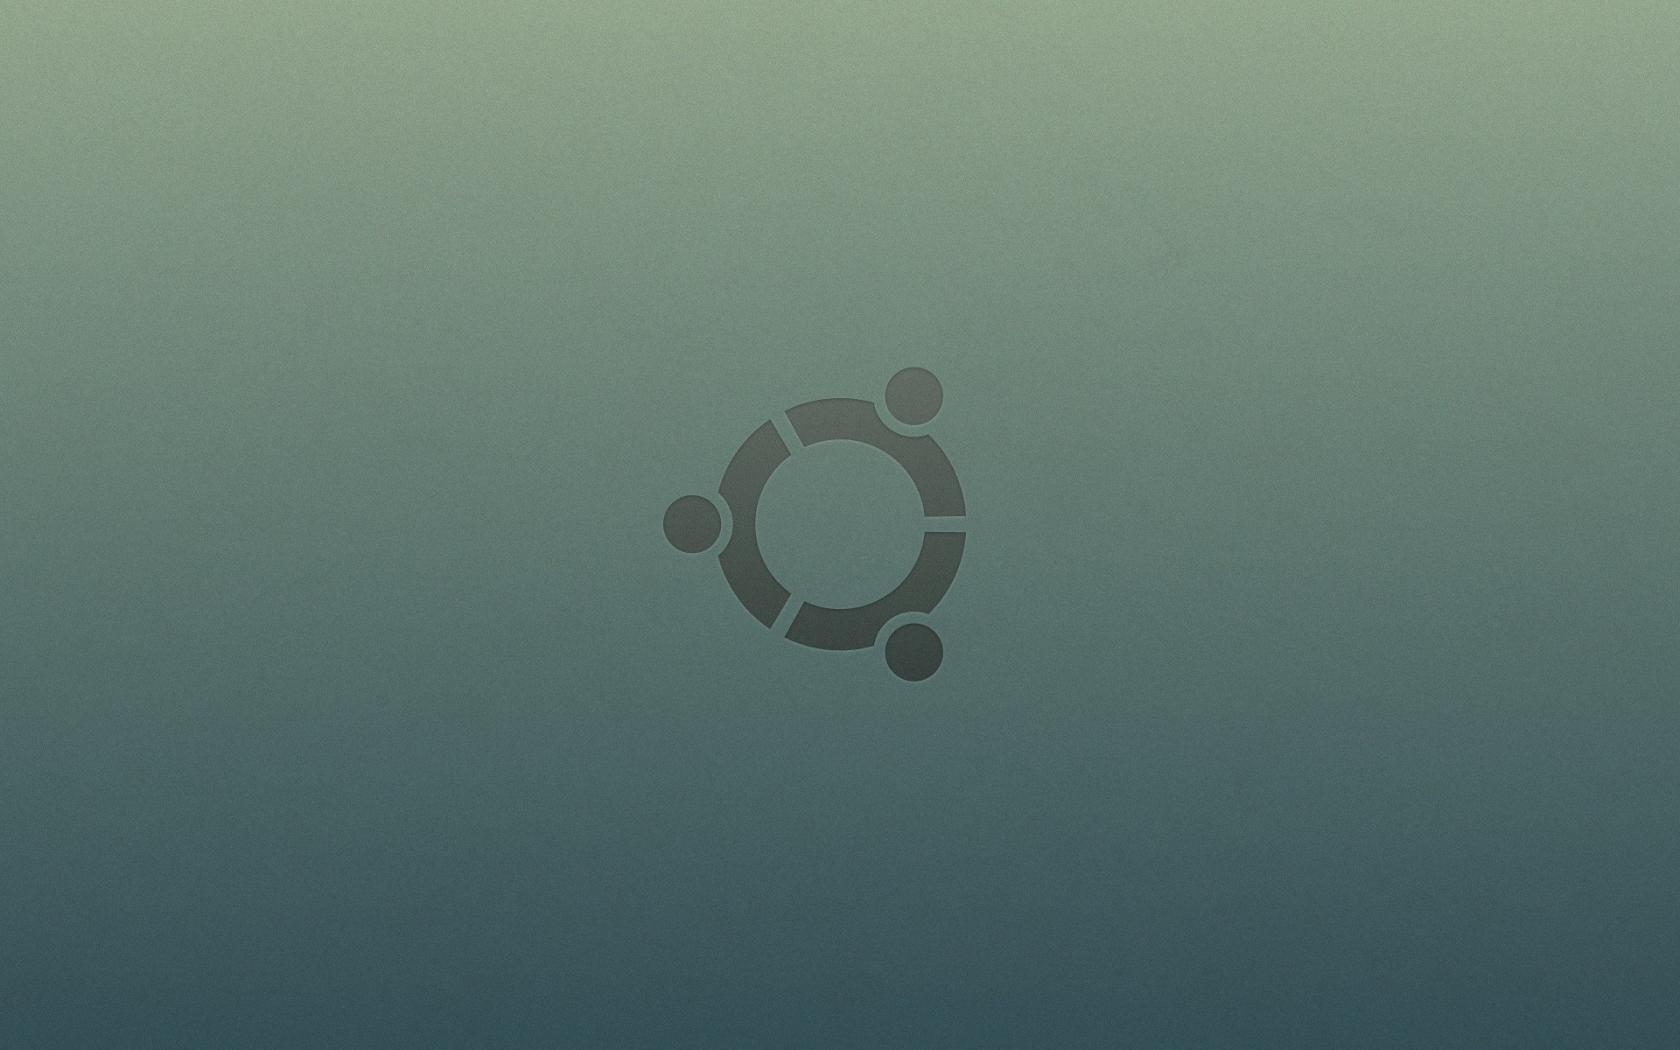 Ubuntu logo - 1680x1050